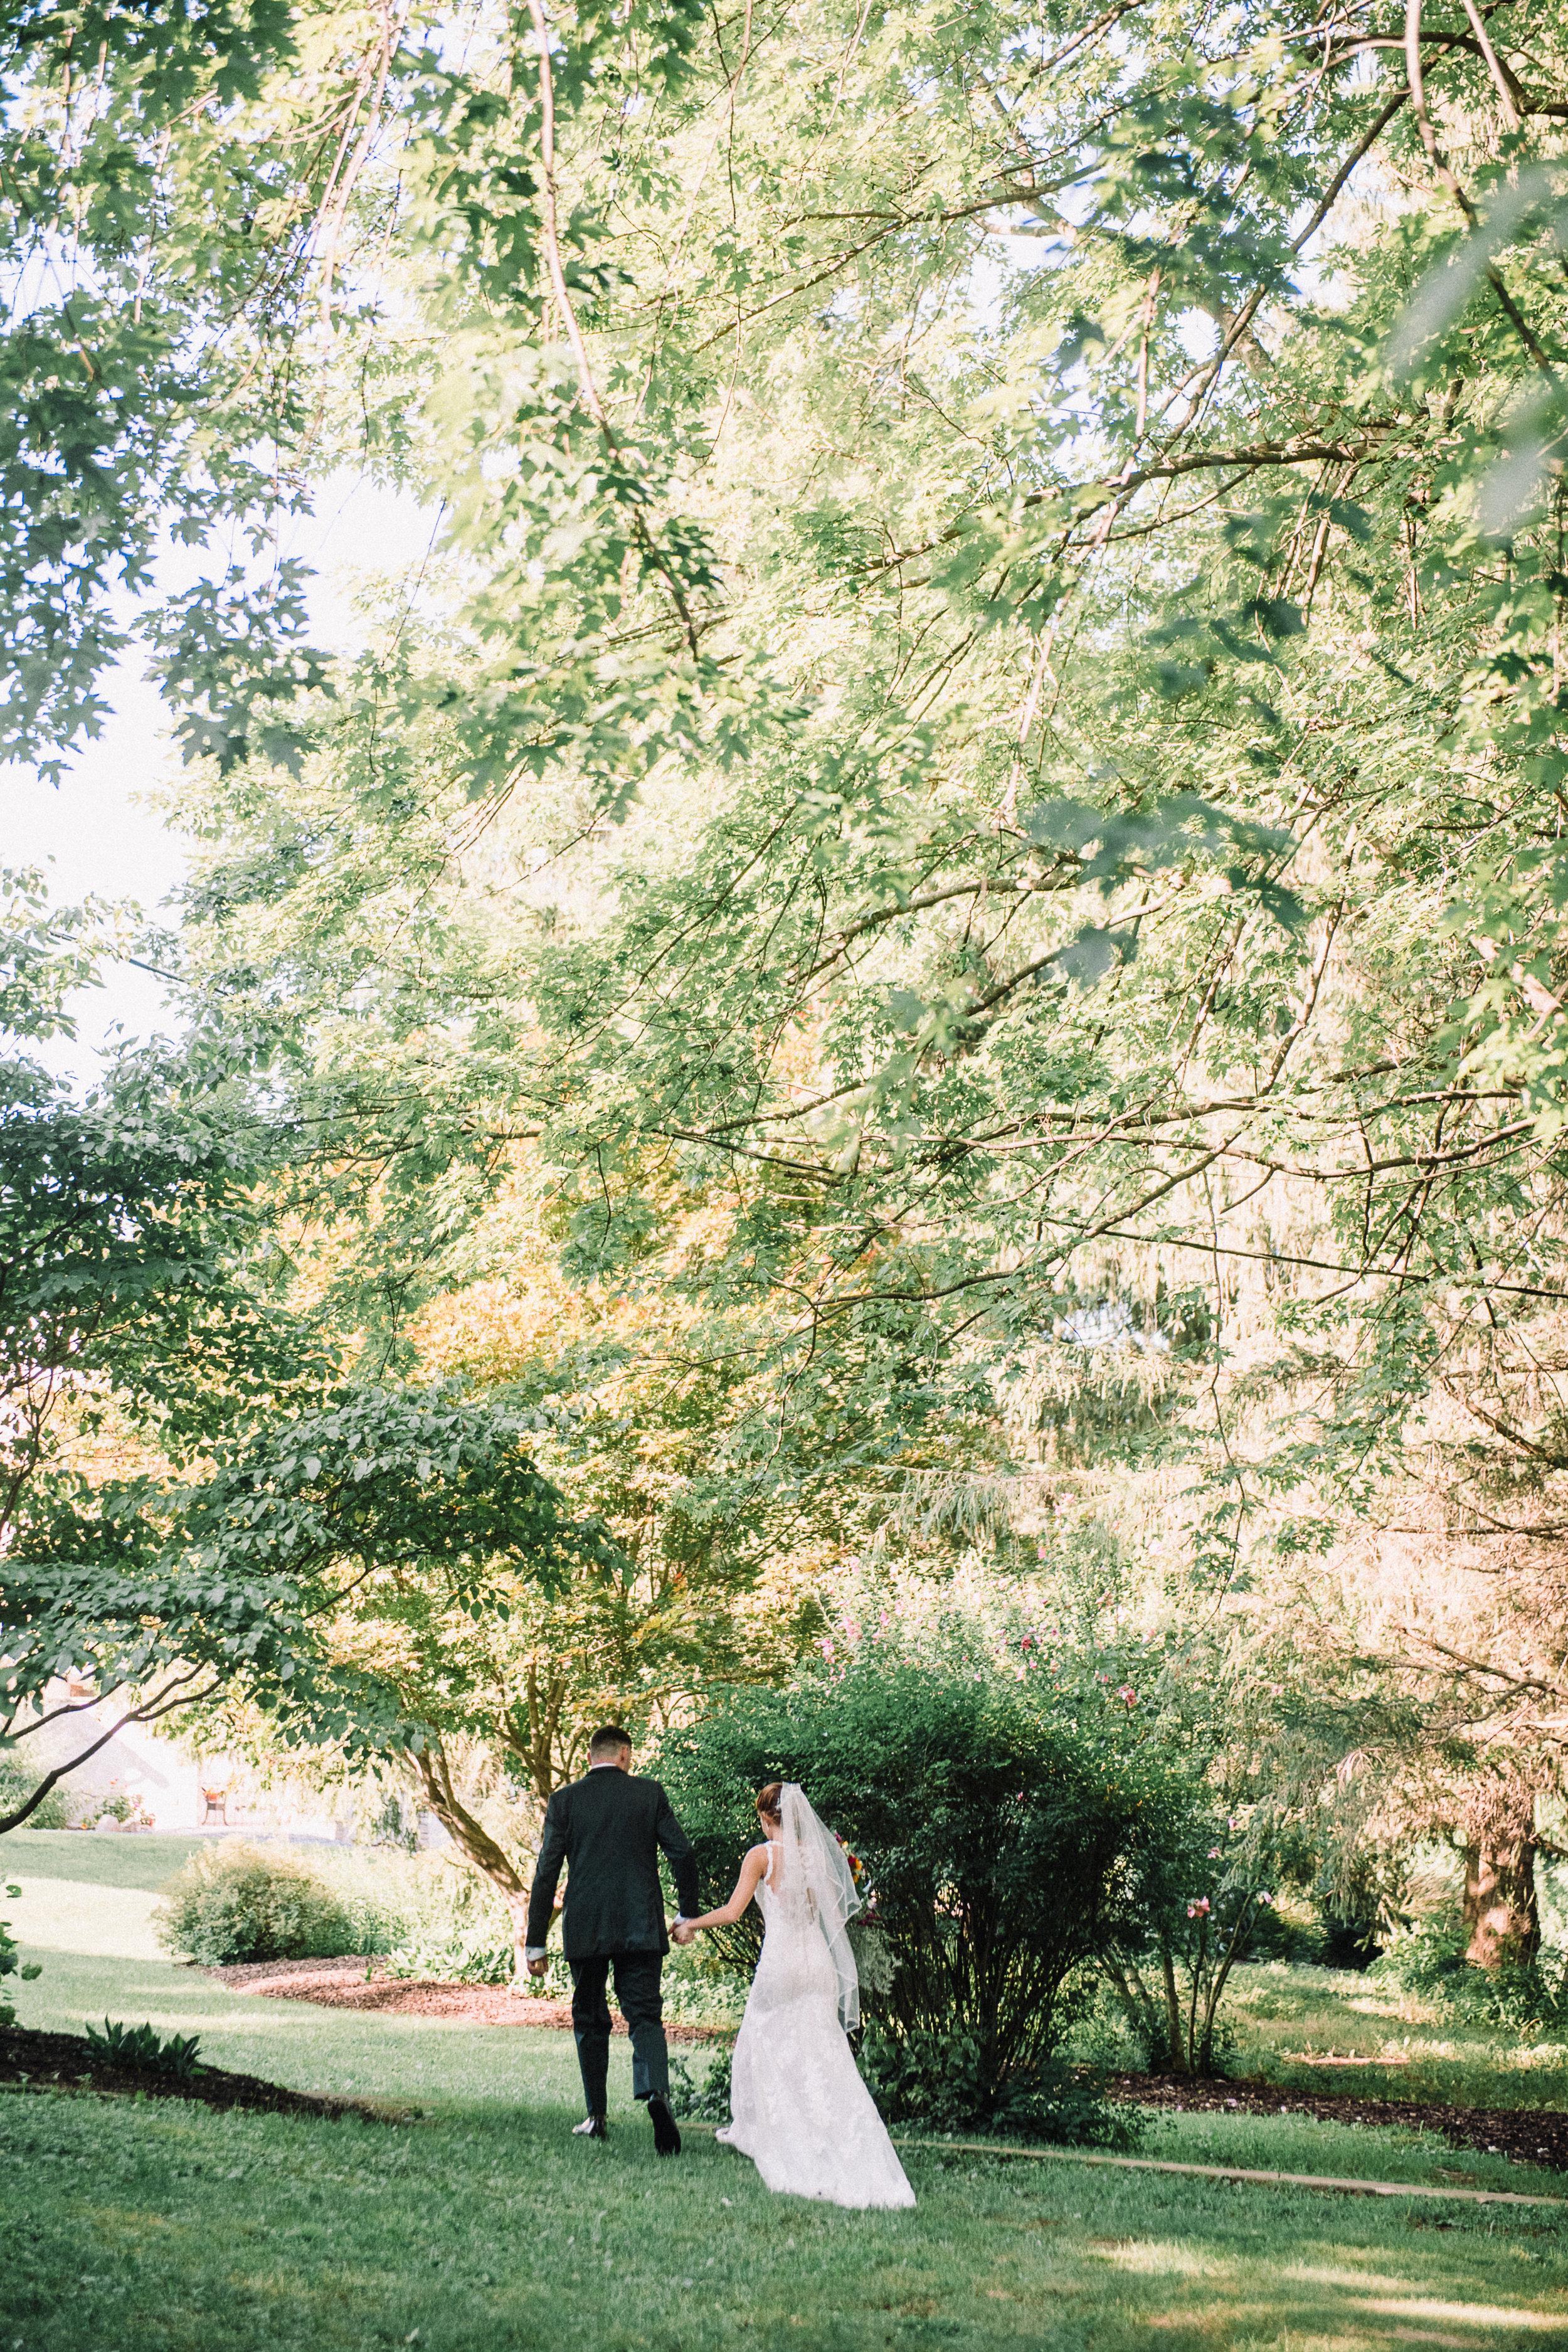 062ninalilyphoto-groveatkemptonwedding-hicksblog.jpg